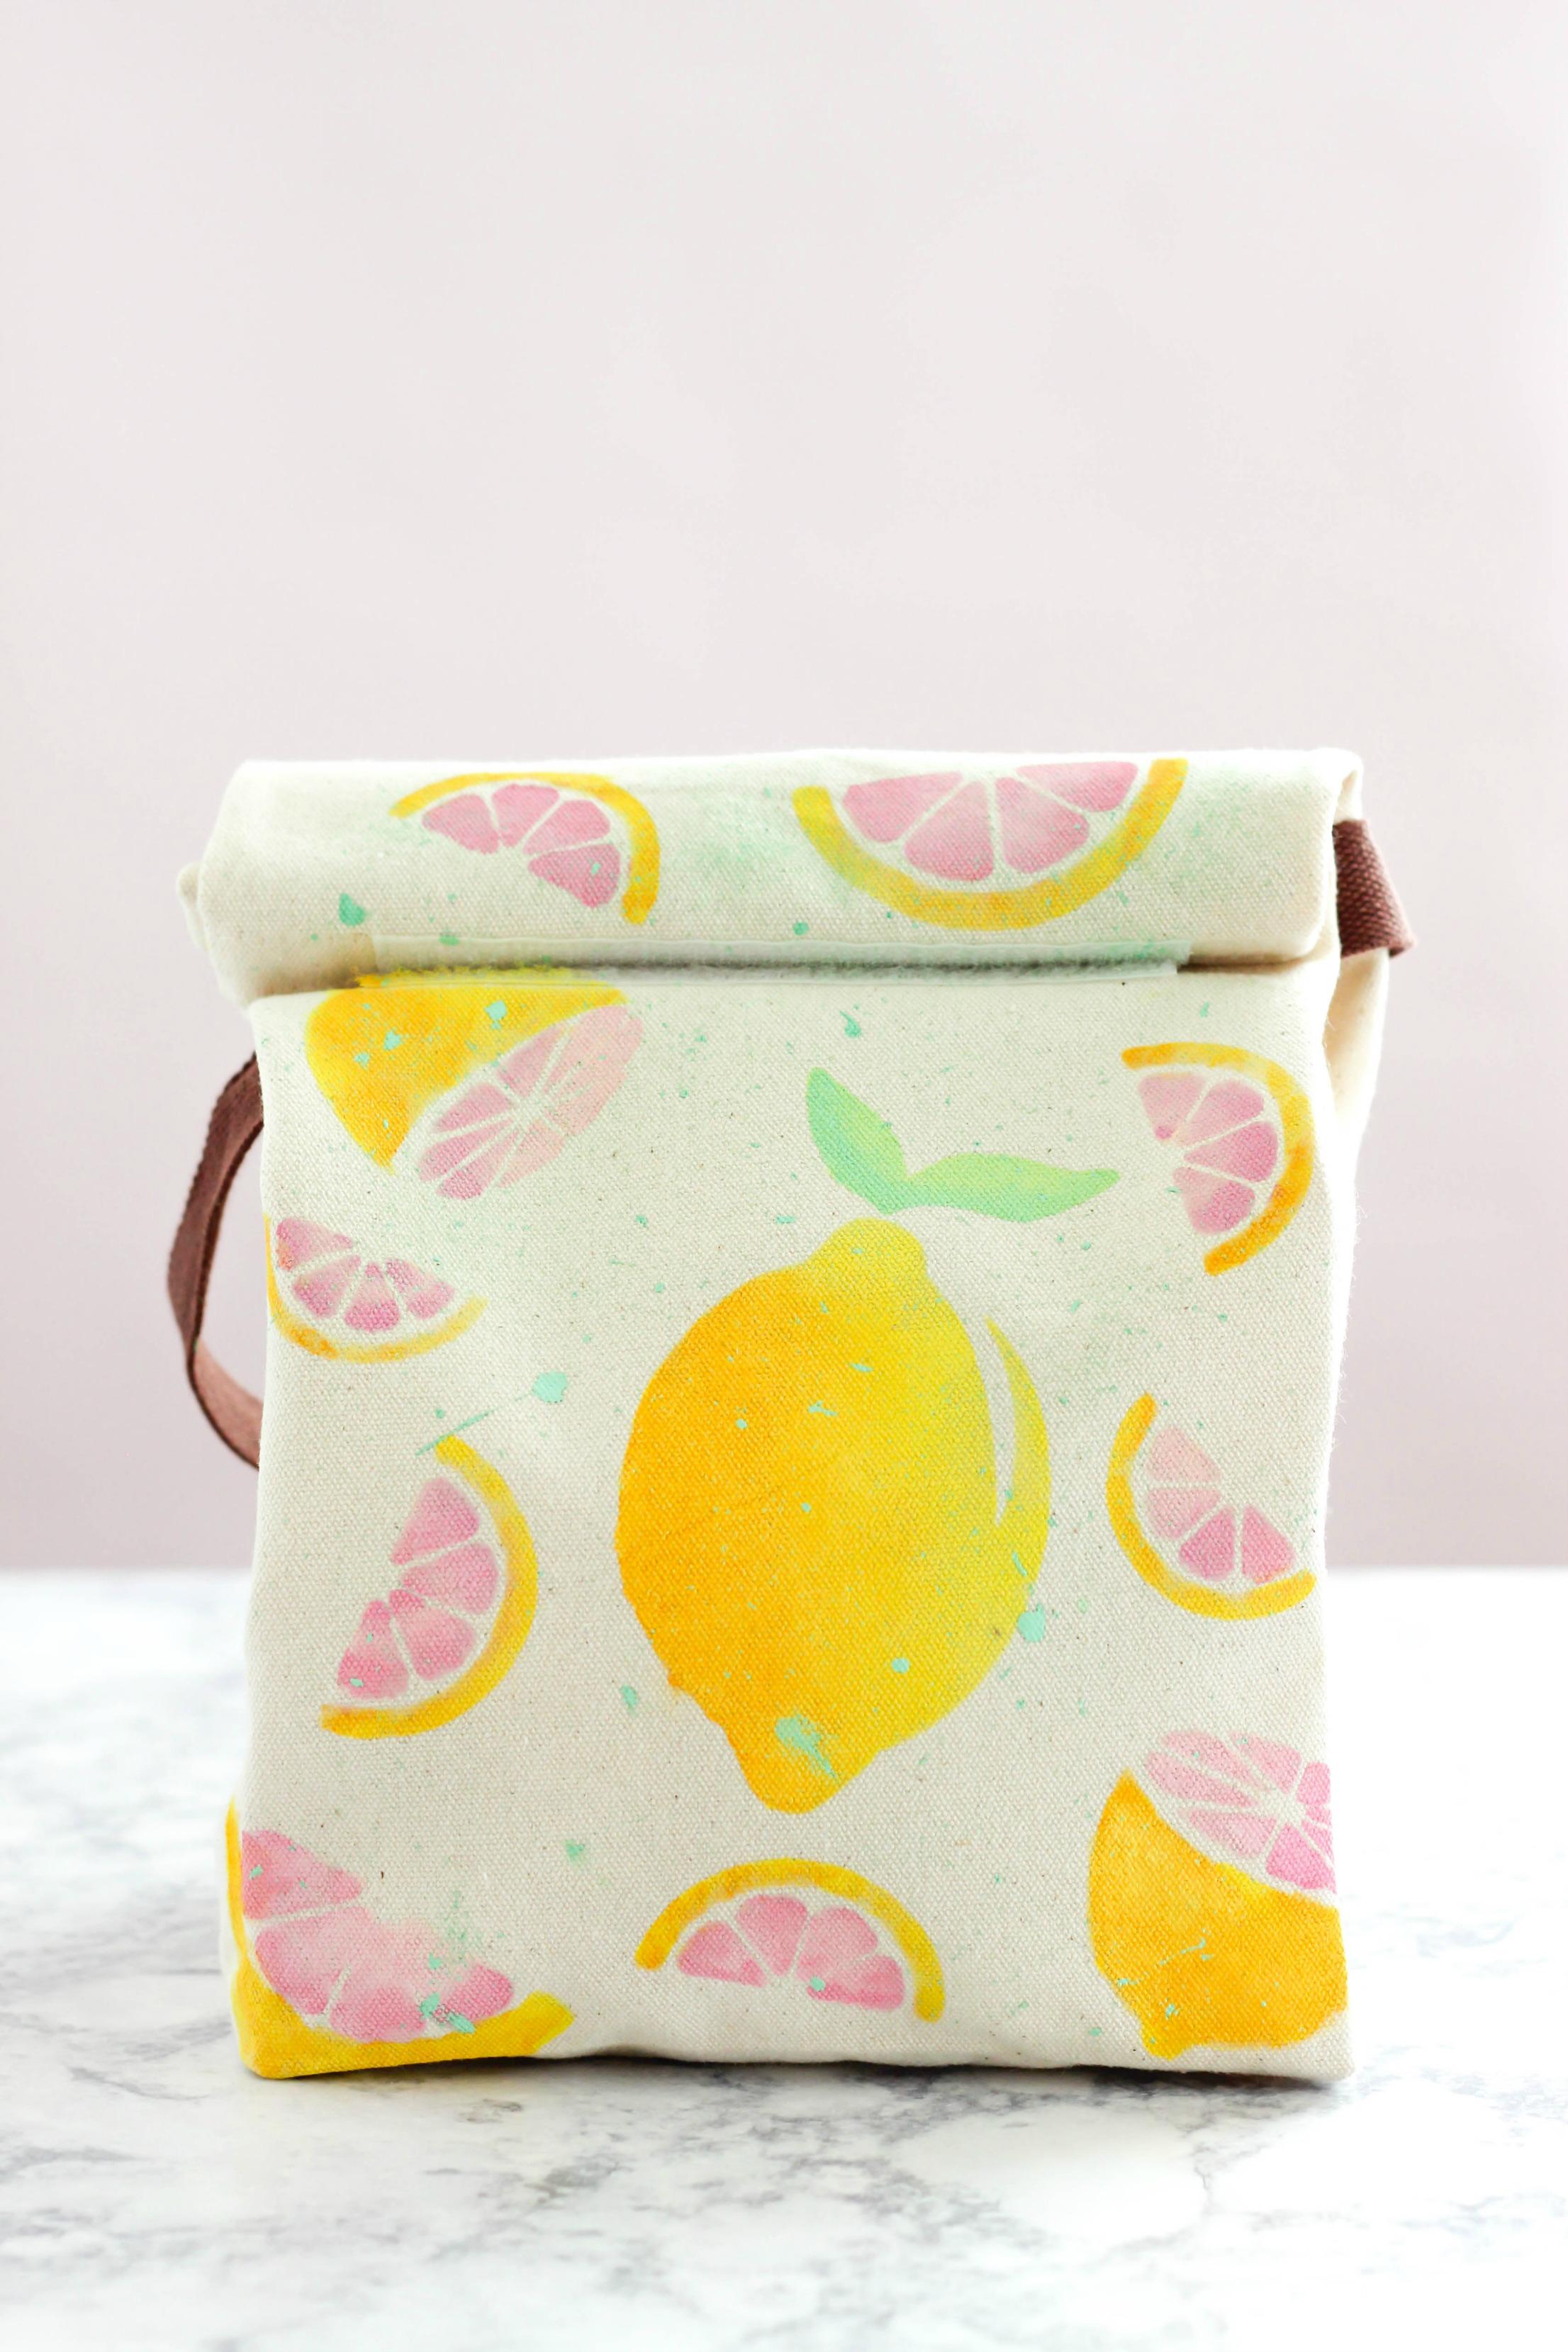 DIY lemon stenciled colorful lunch bag